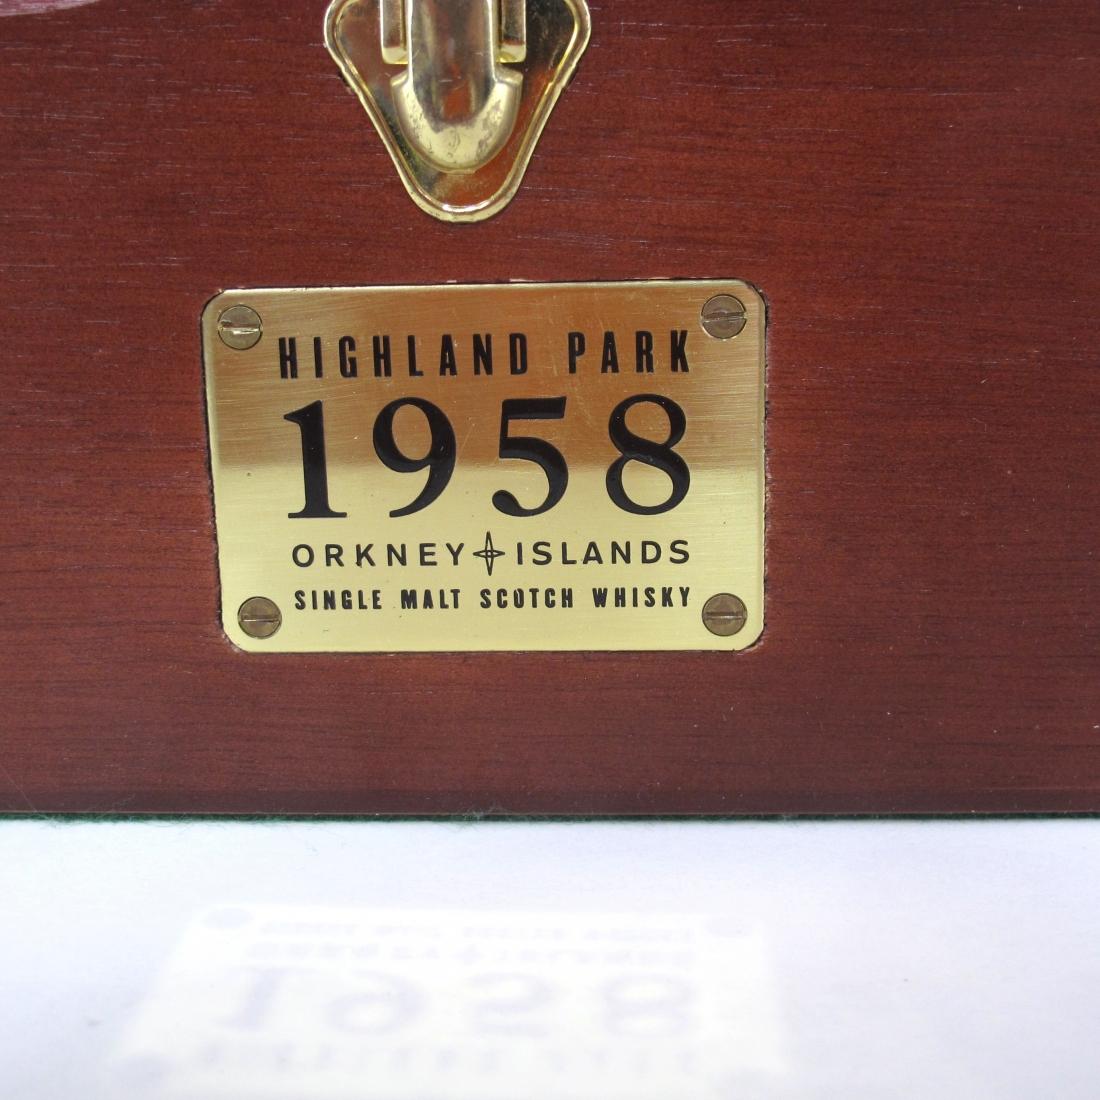 Highland Park 1958 40 Year Old